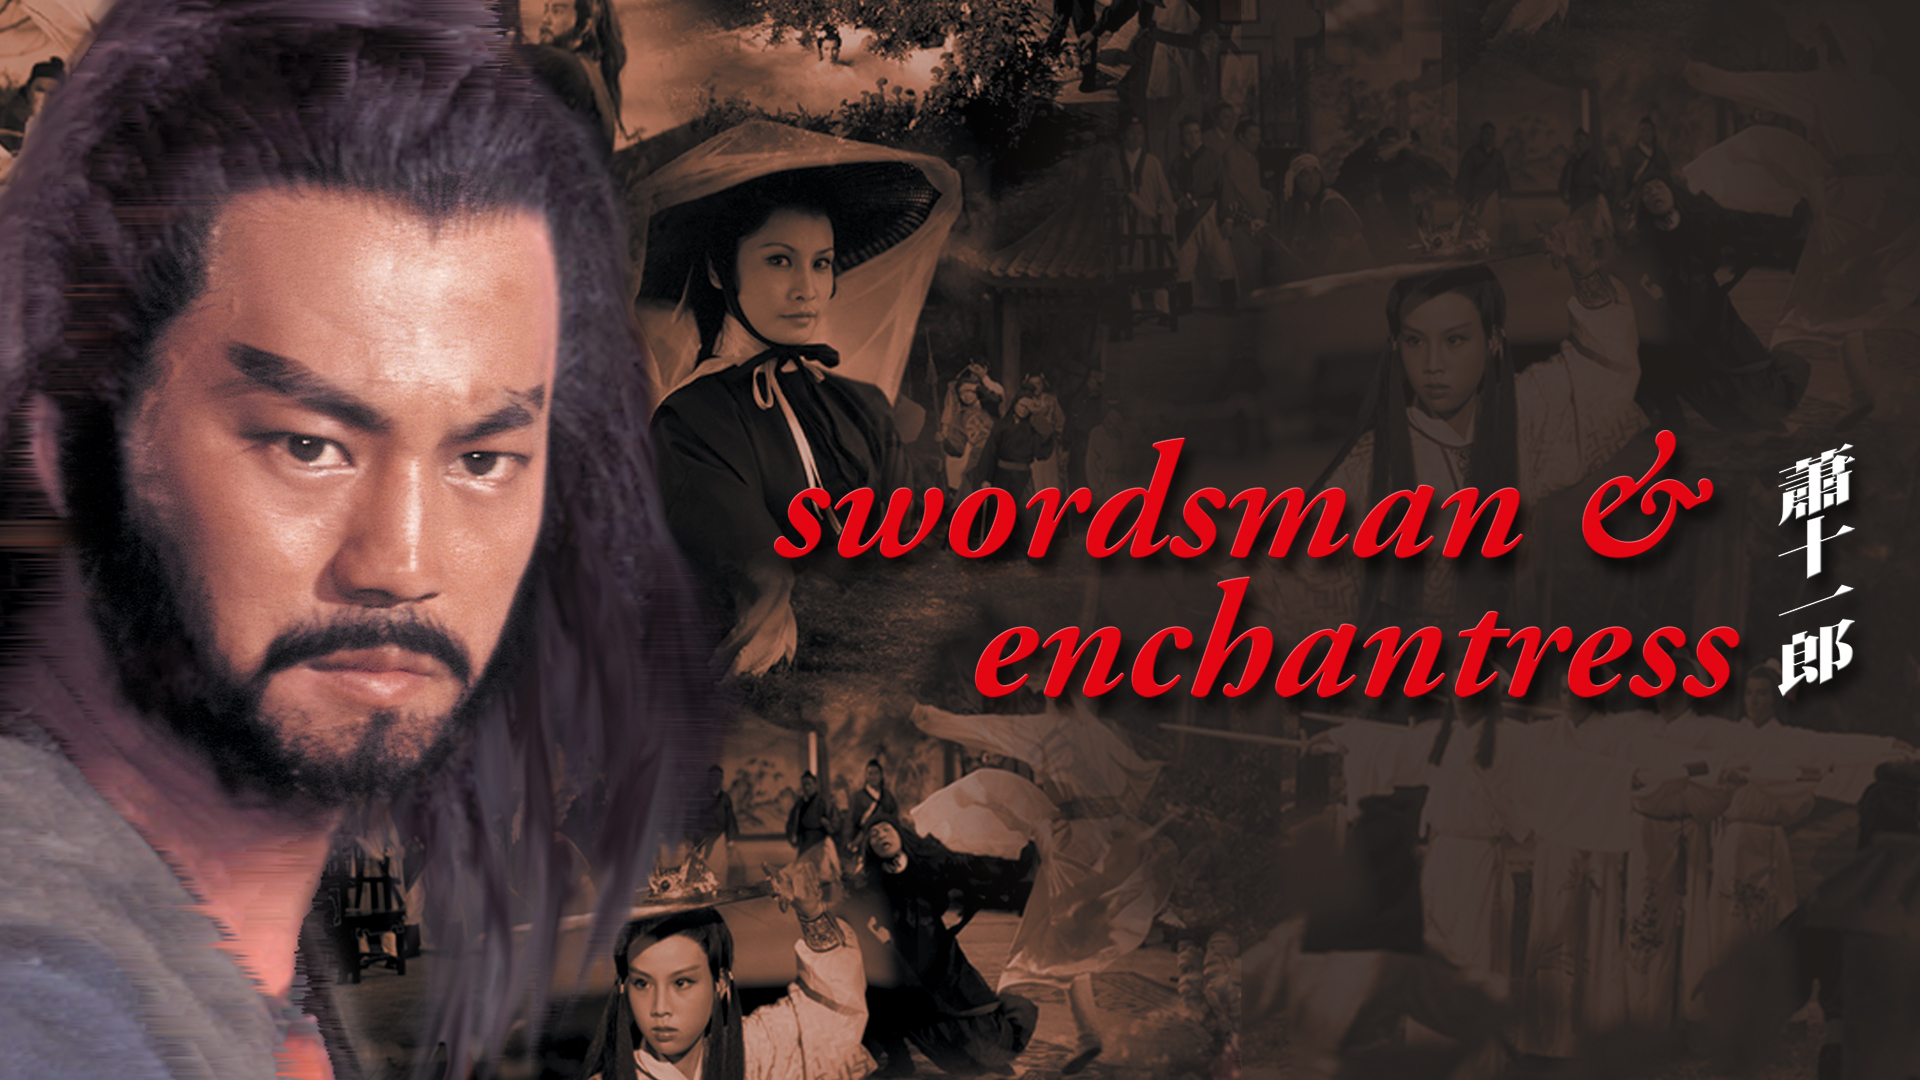 Swordsman and Enchantress